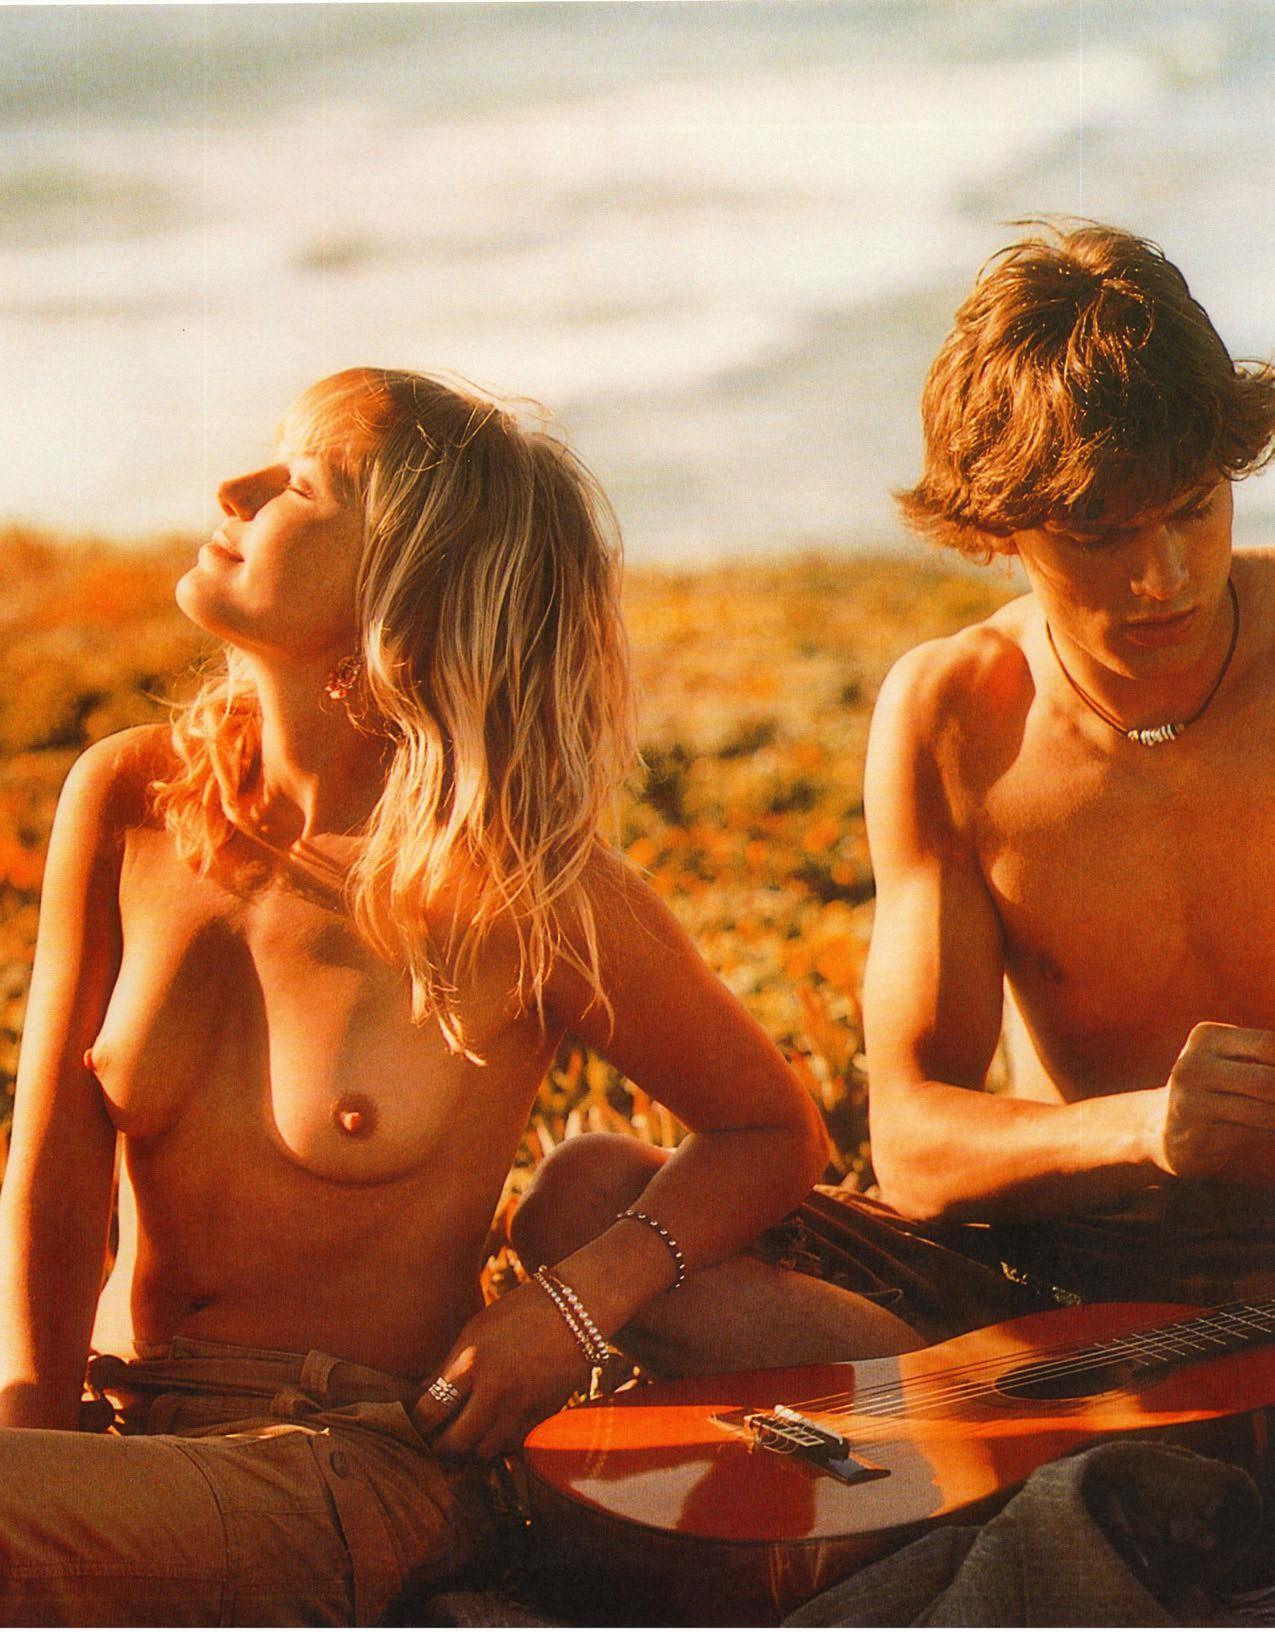 fotos Malin Akerman desnuda